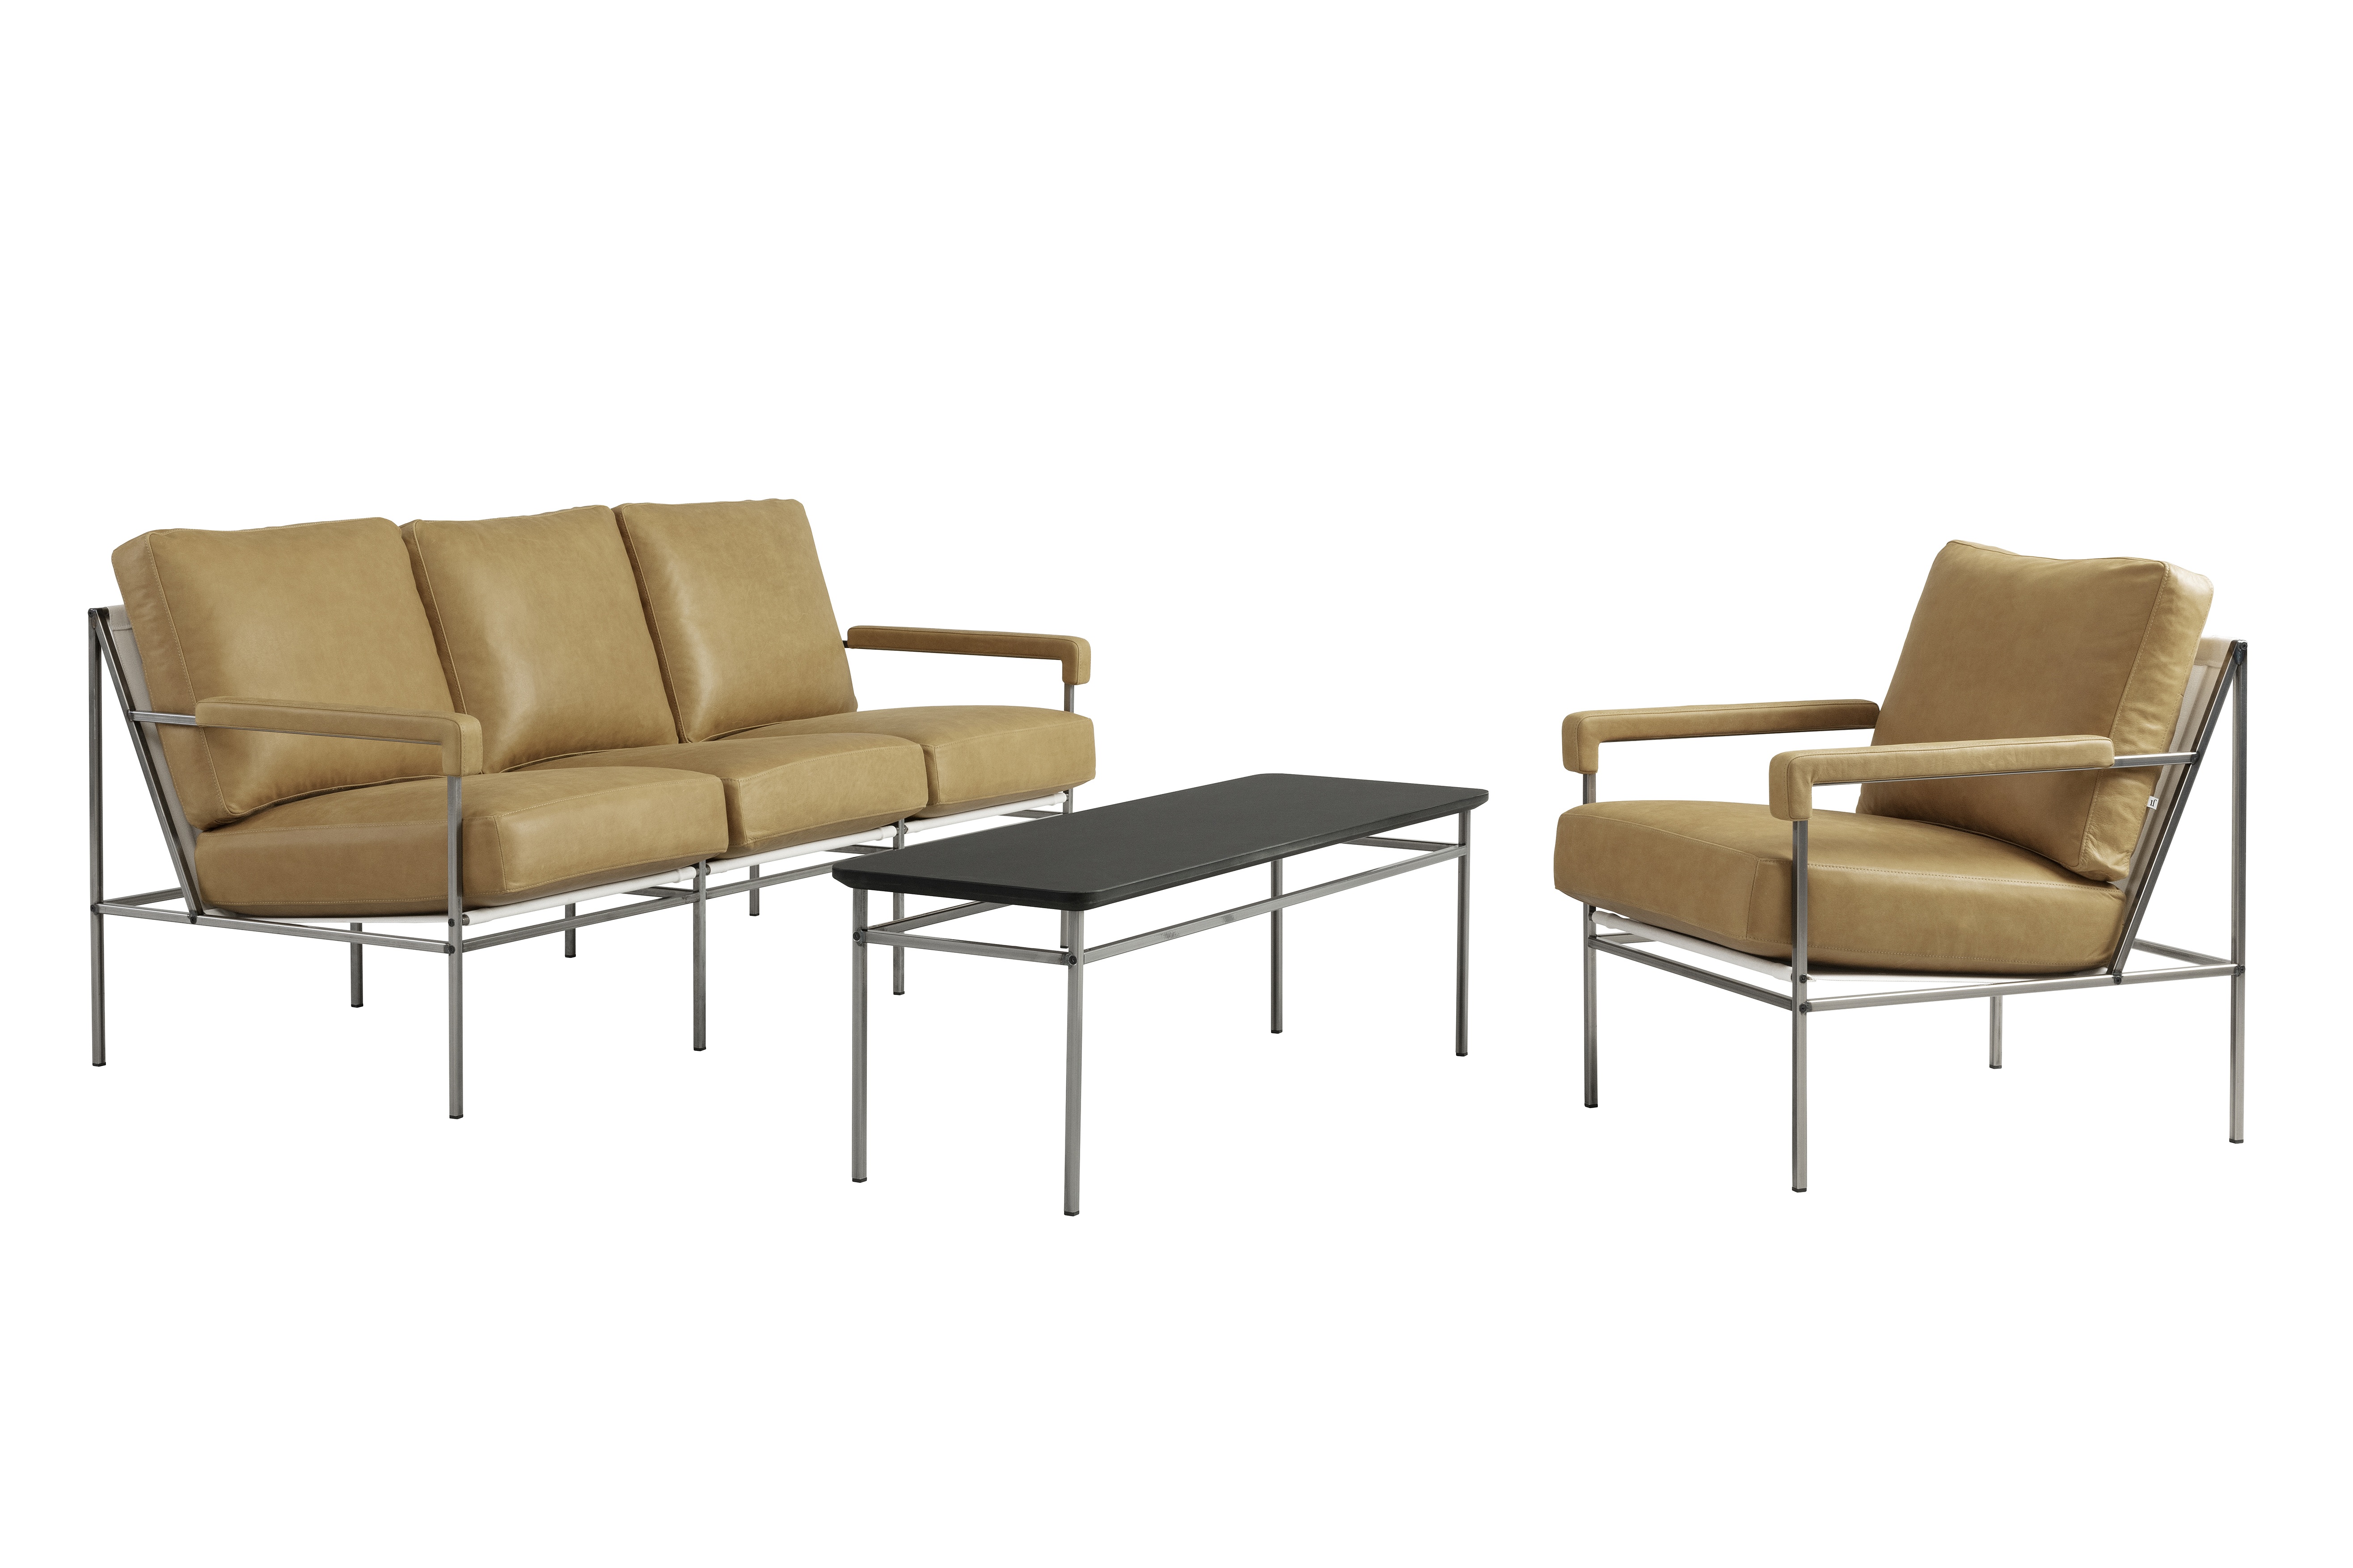 Seventy Five sofa by Jonas Ihreborn